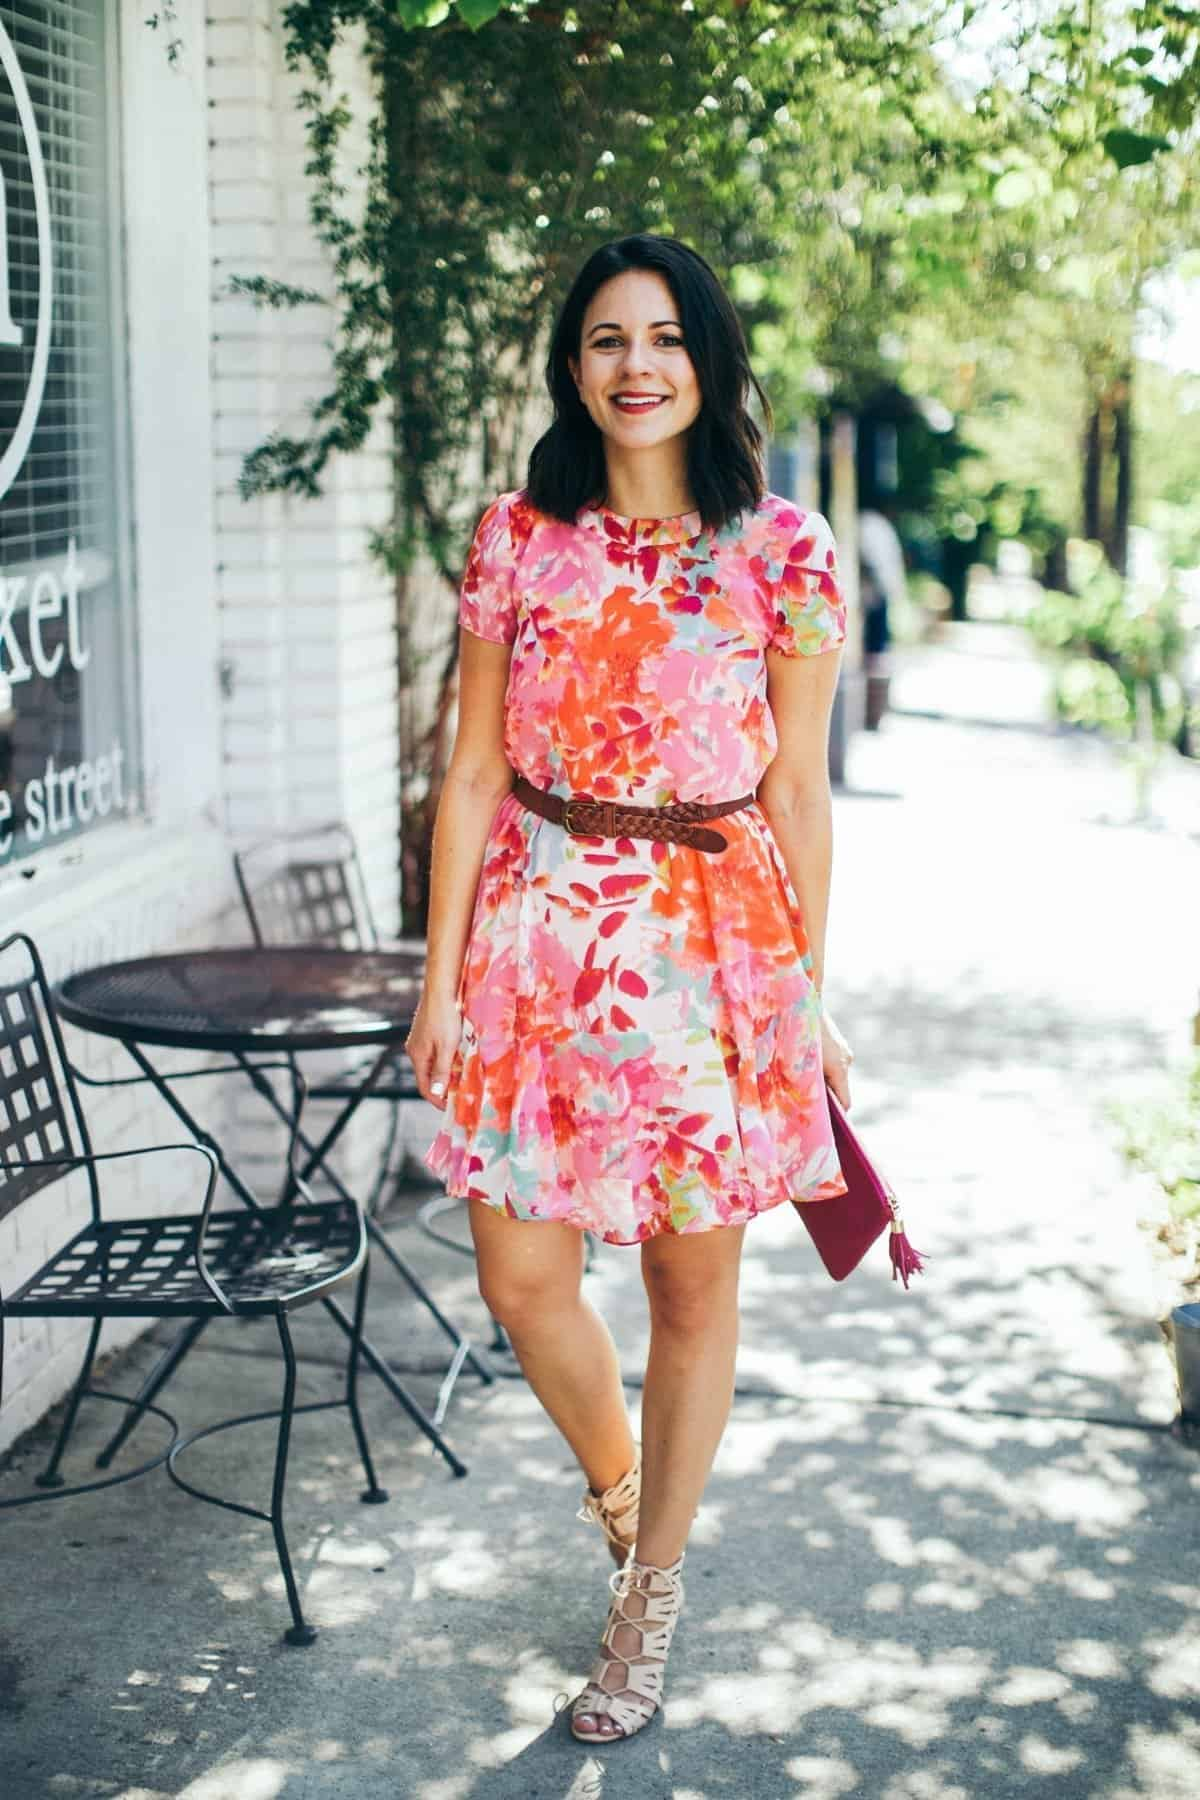 Eliza J floral printed summer dress - summer dress outfit ideas - My Style Vita @mystylevita - 8